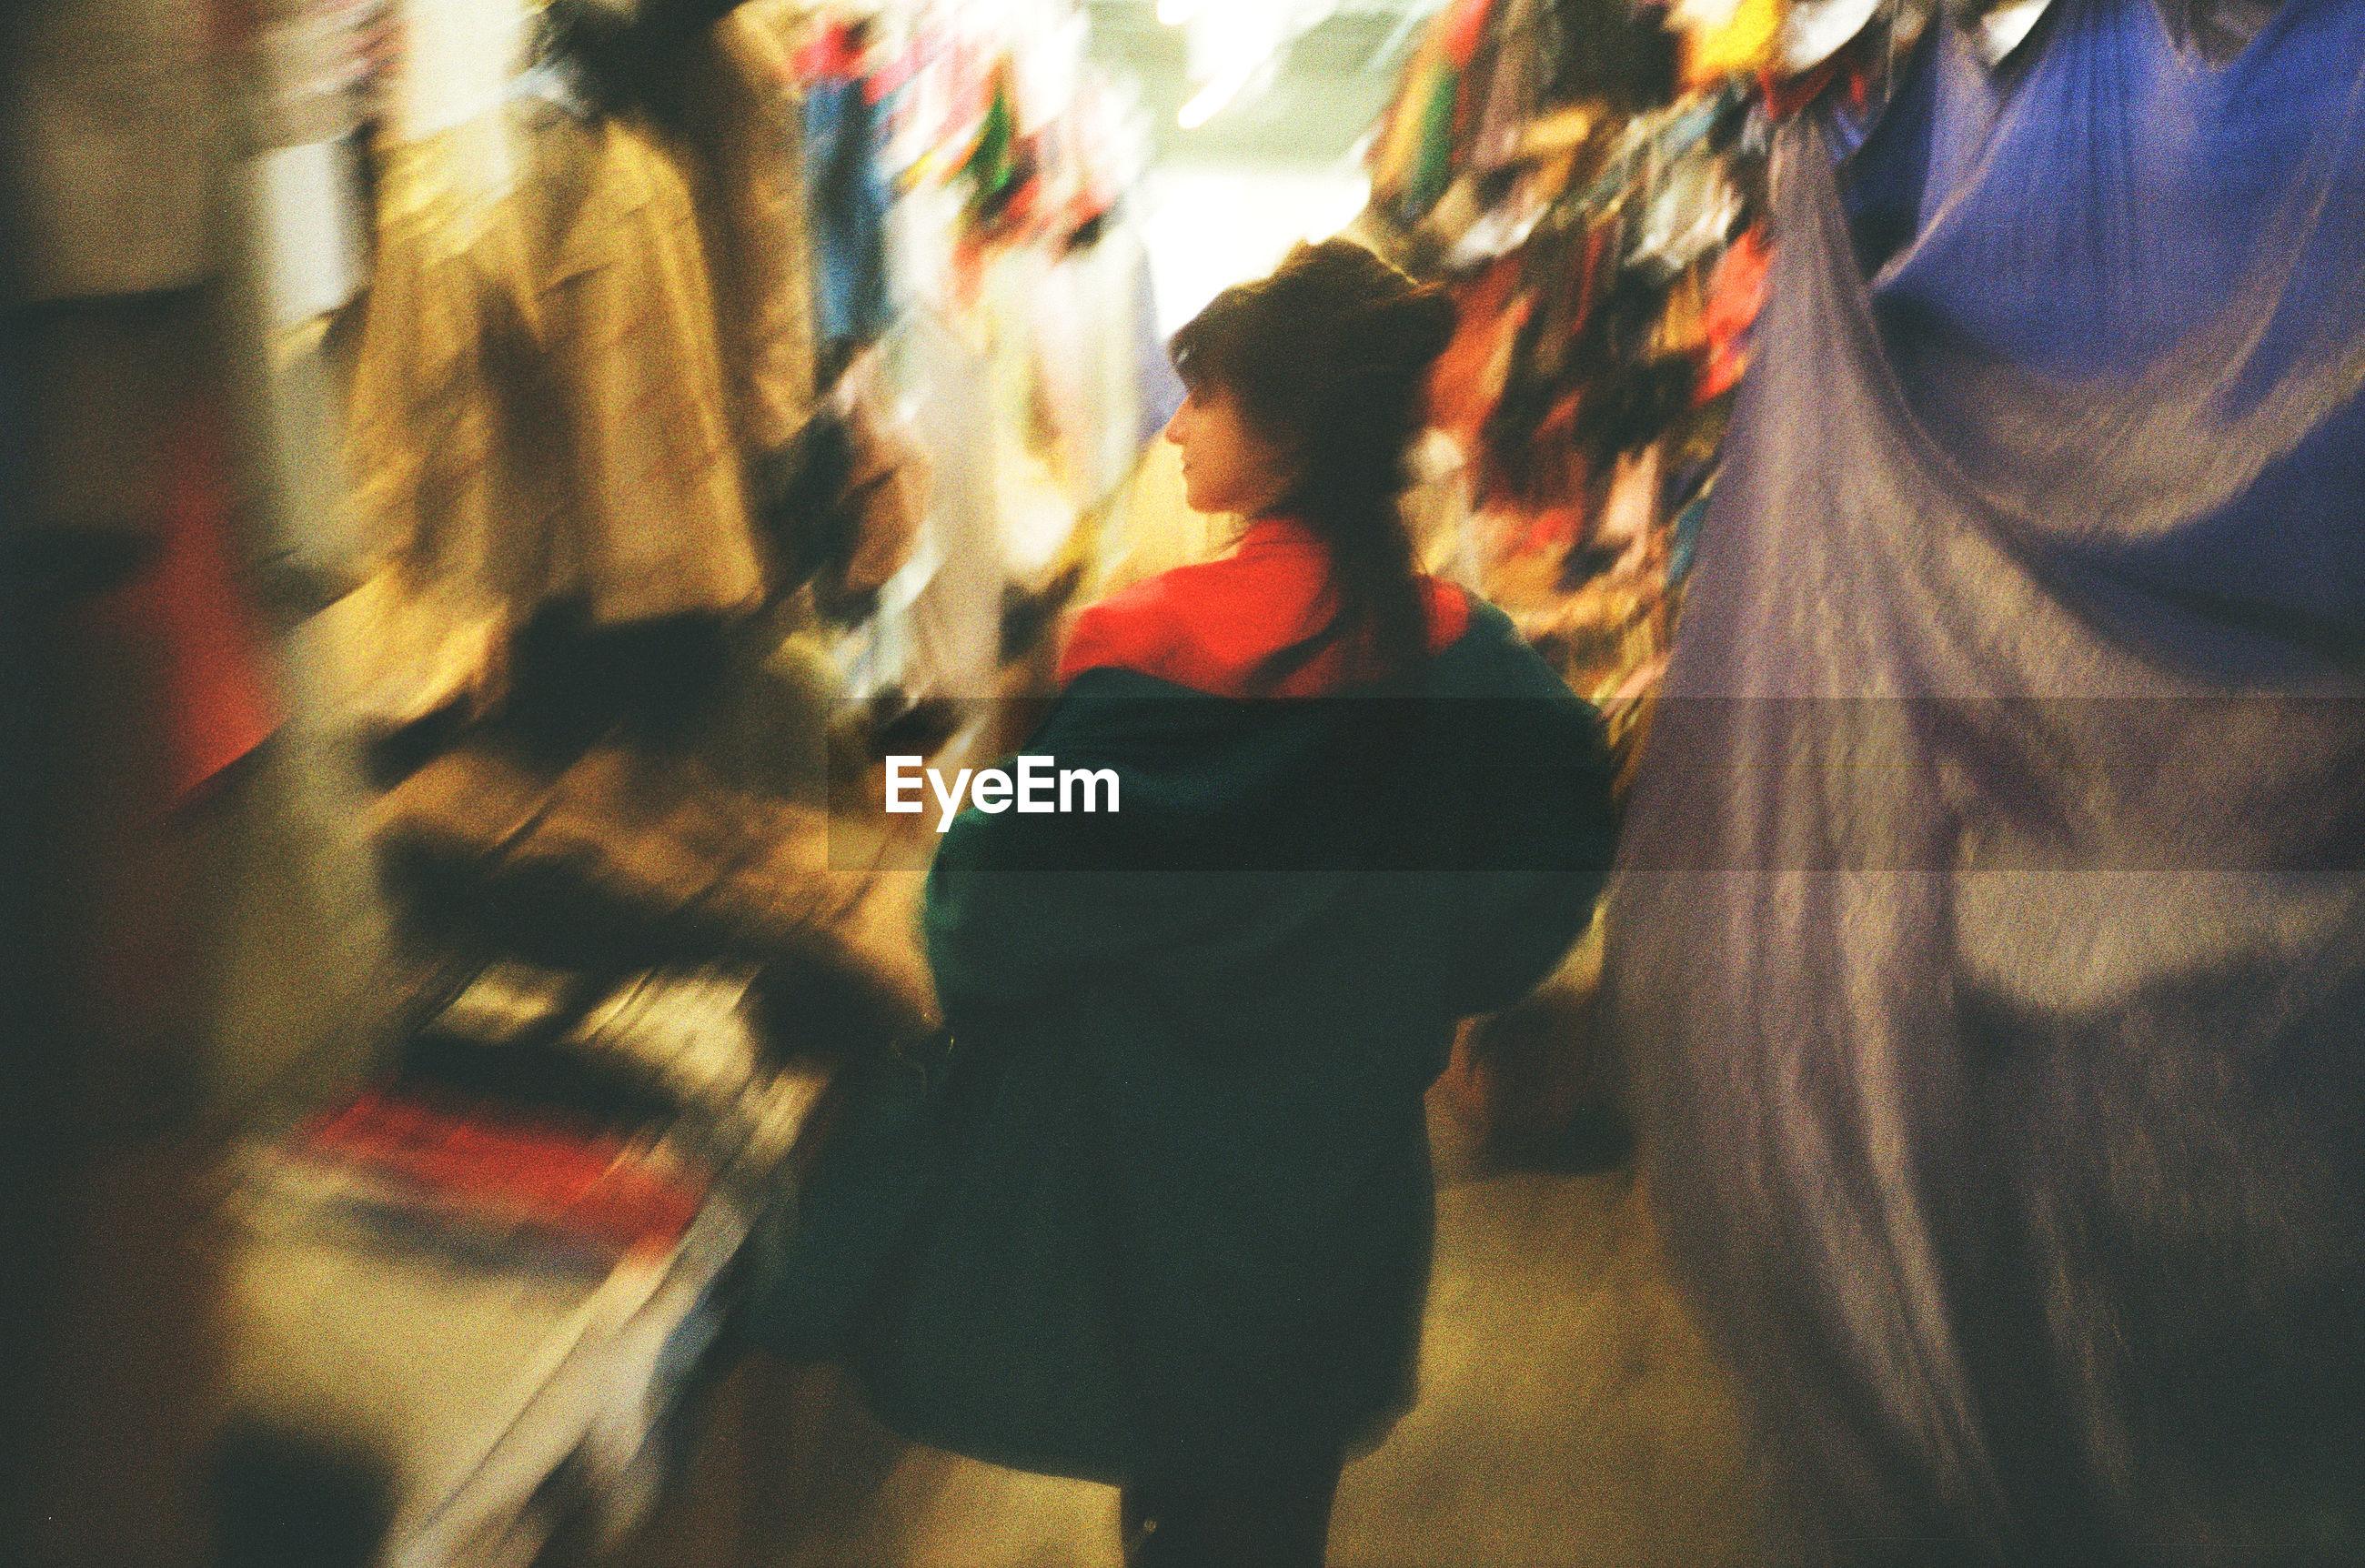 BLURRED IMAGE OF WOMAN WALKING ON STREET